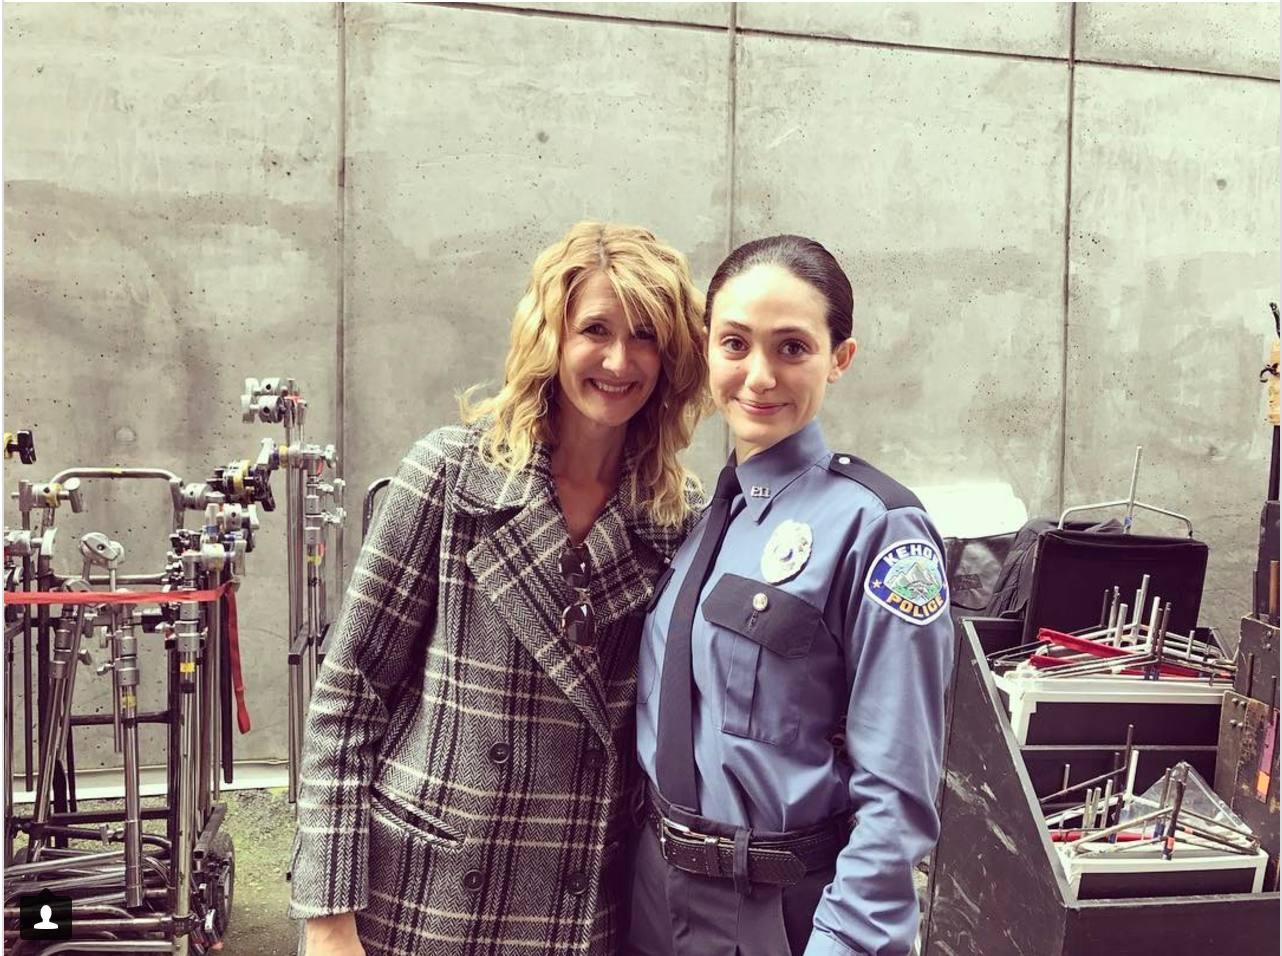 'Shameless' Season 8 Star Emmy Rossum Shares On Set Photo